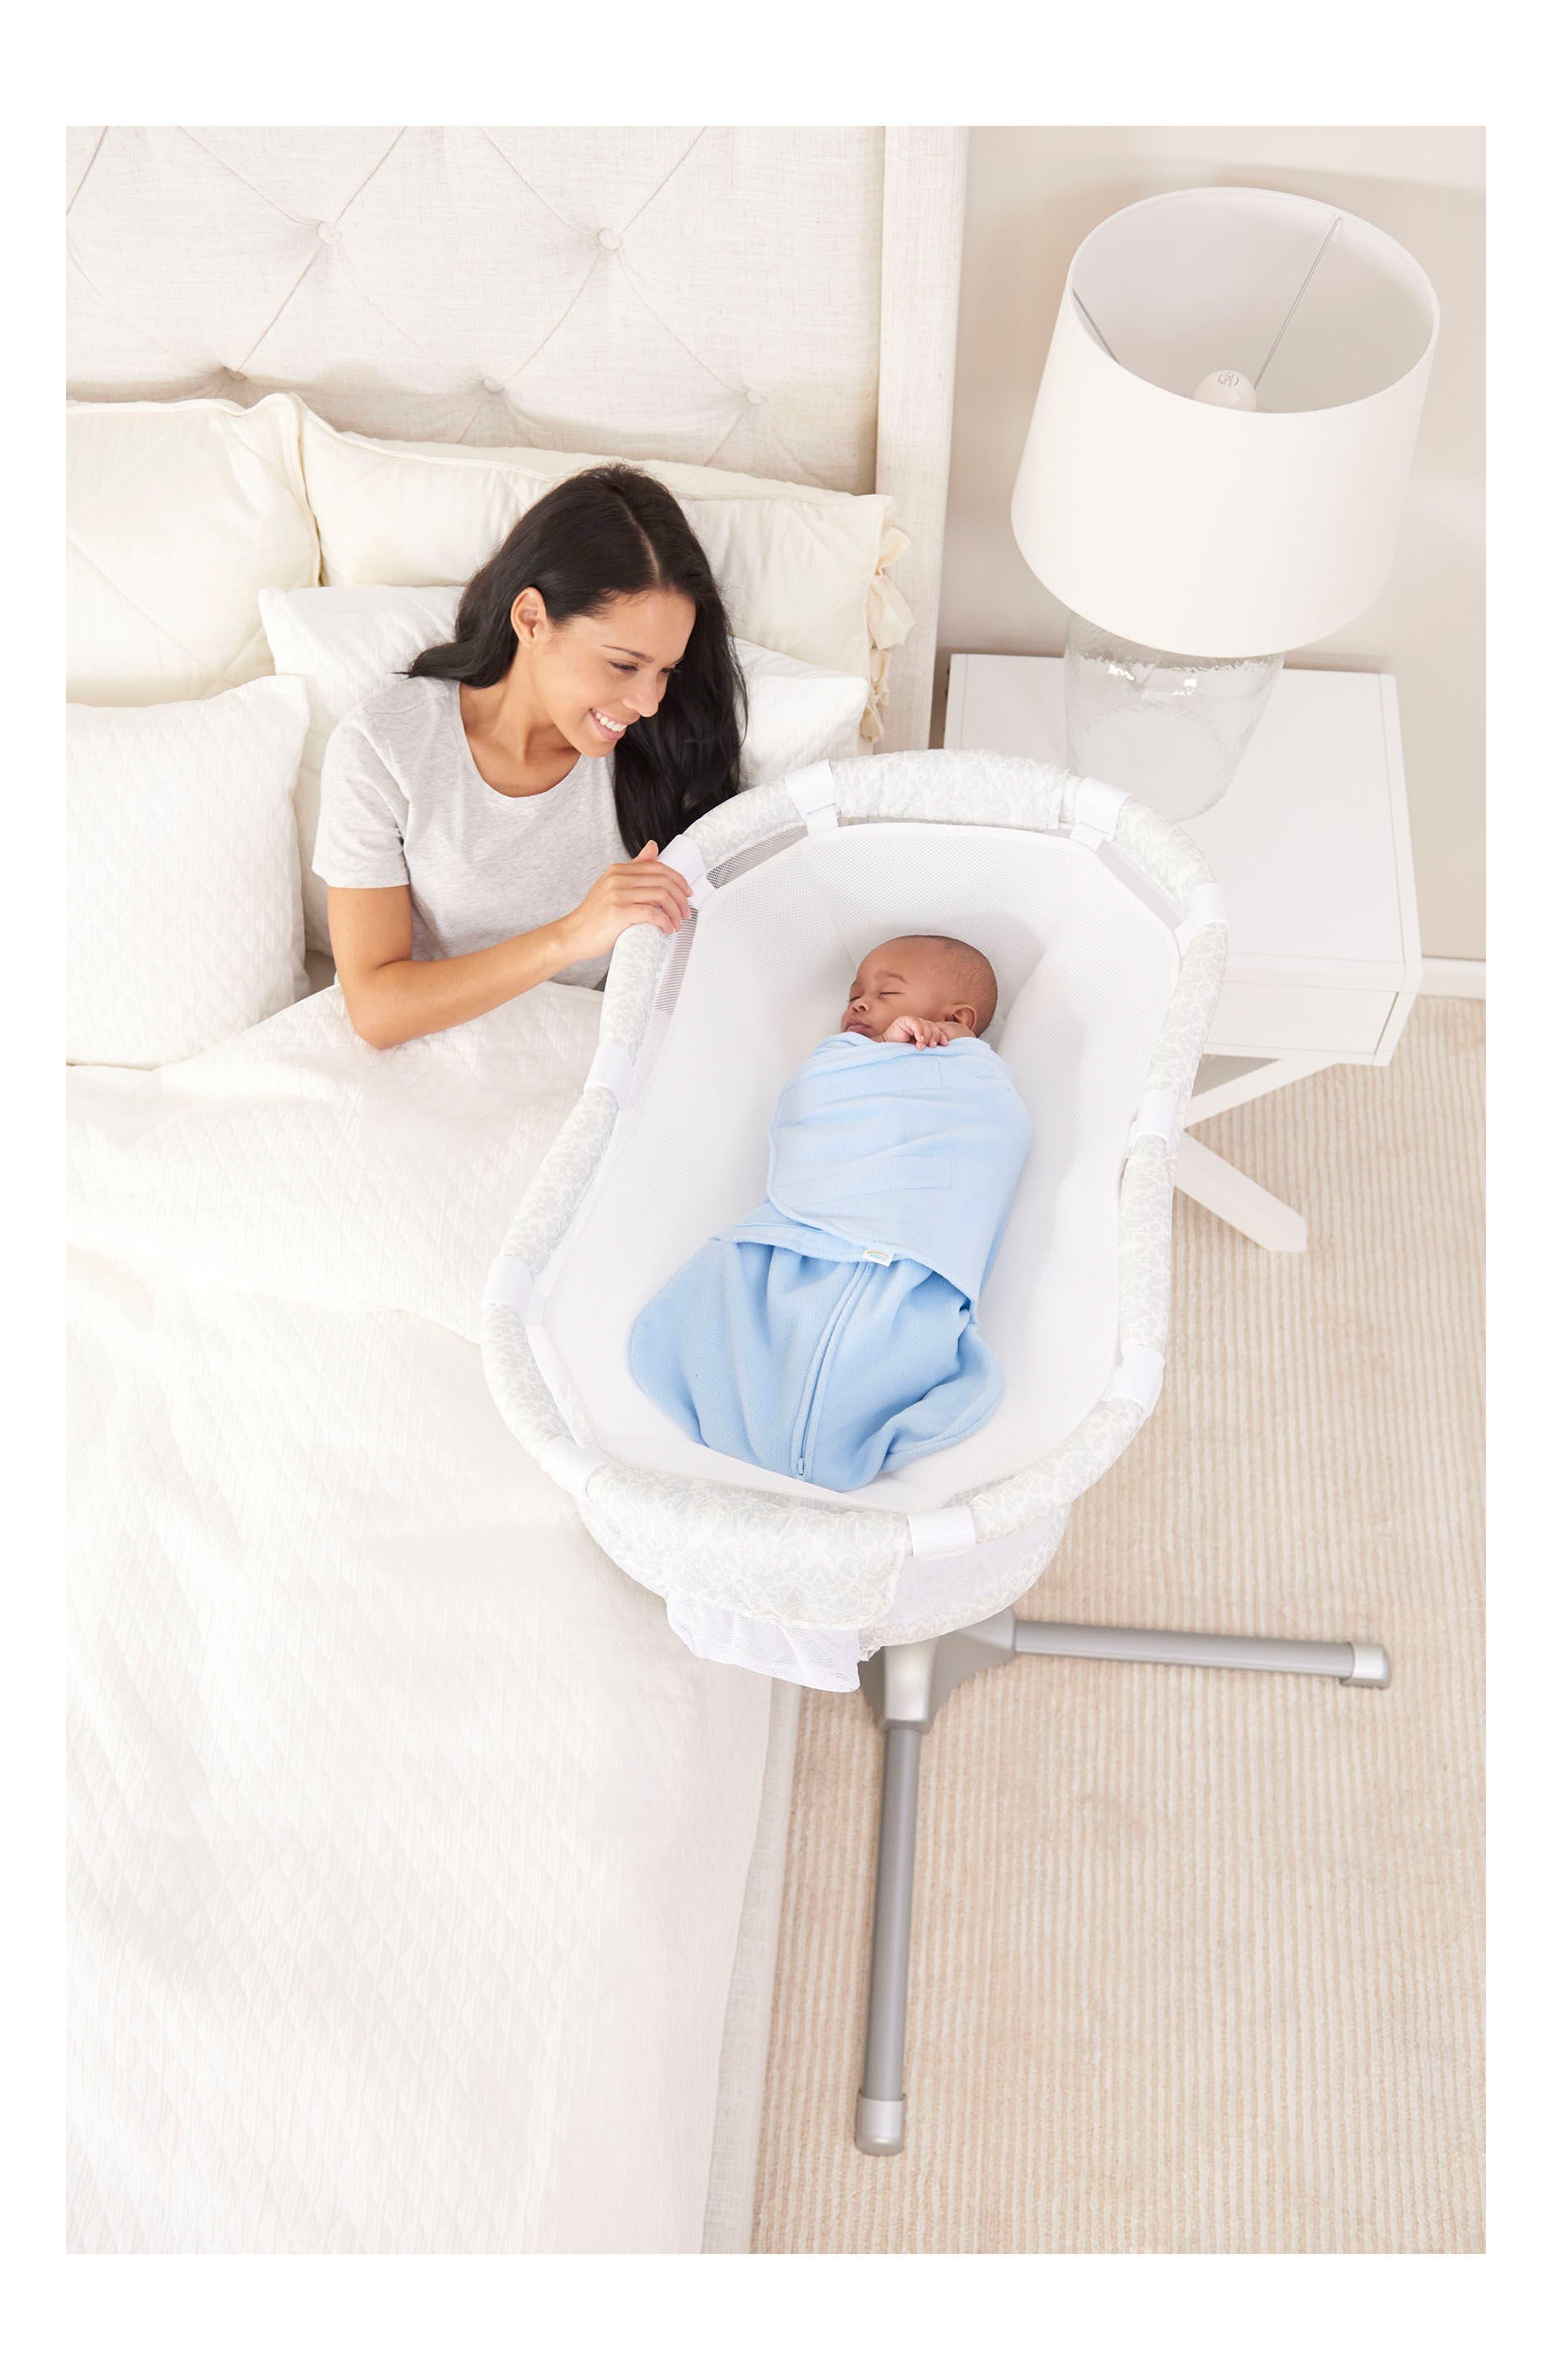 Newborn Cuddle Insert for Bassinest<sup>™</sup> Bedside Swivel Sleeper,                             Alternate thumbnail 4, color,                             WHITE MESH